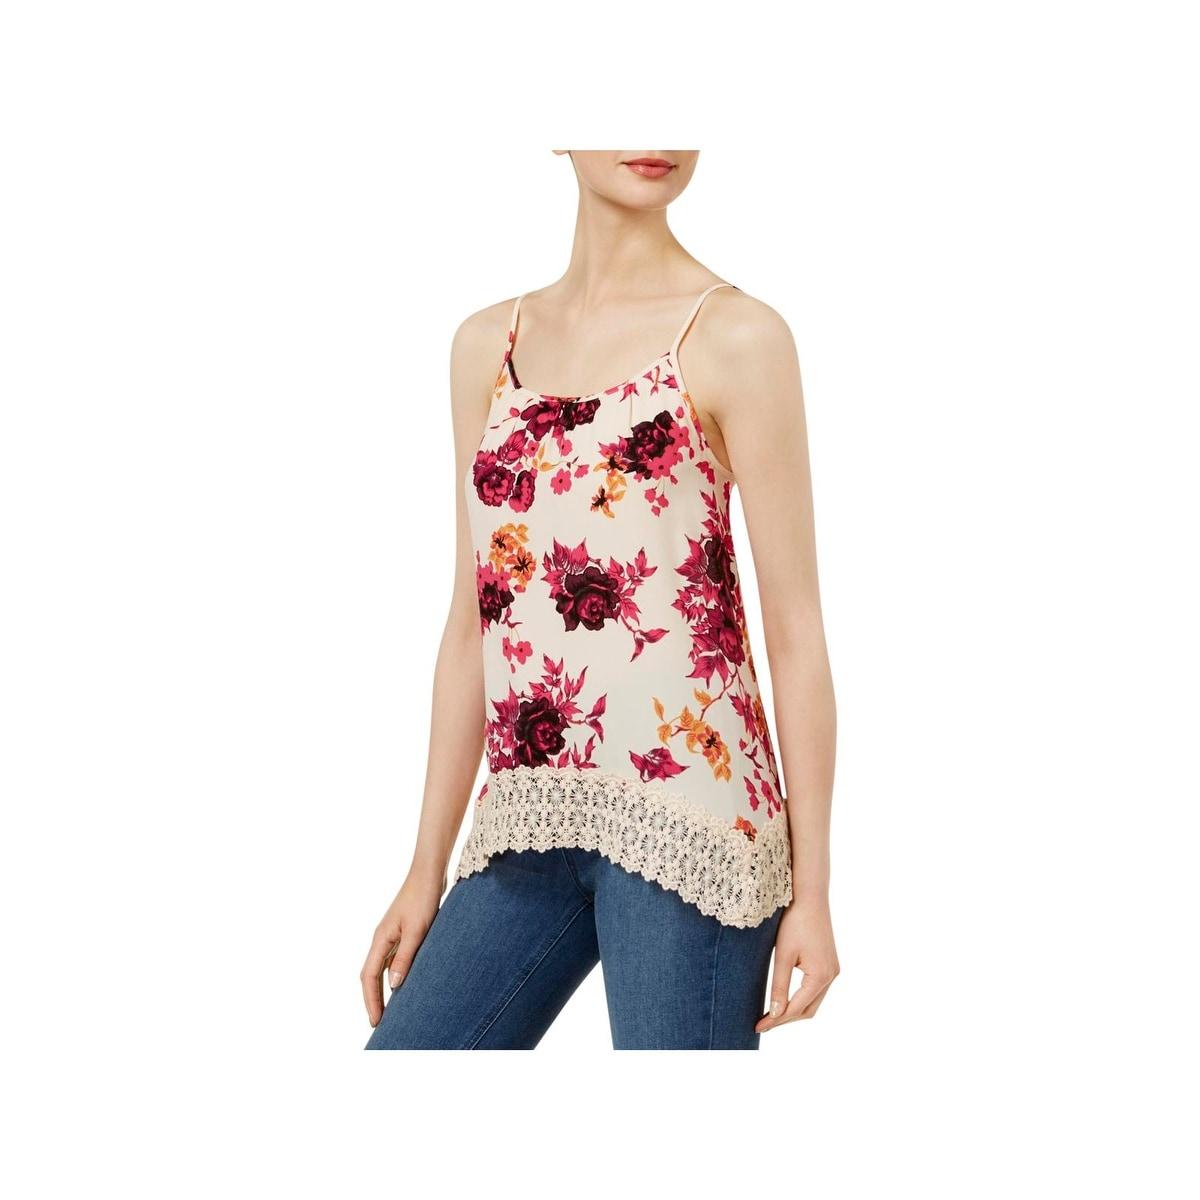 Shop Kensie Womens Camisole Top Floral Print Crochet Trim Free